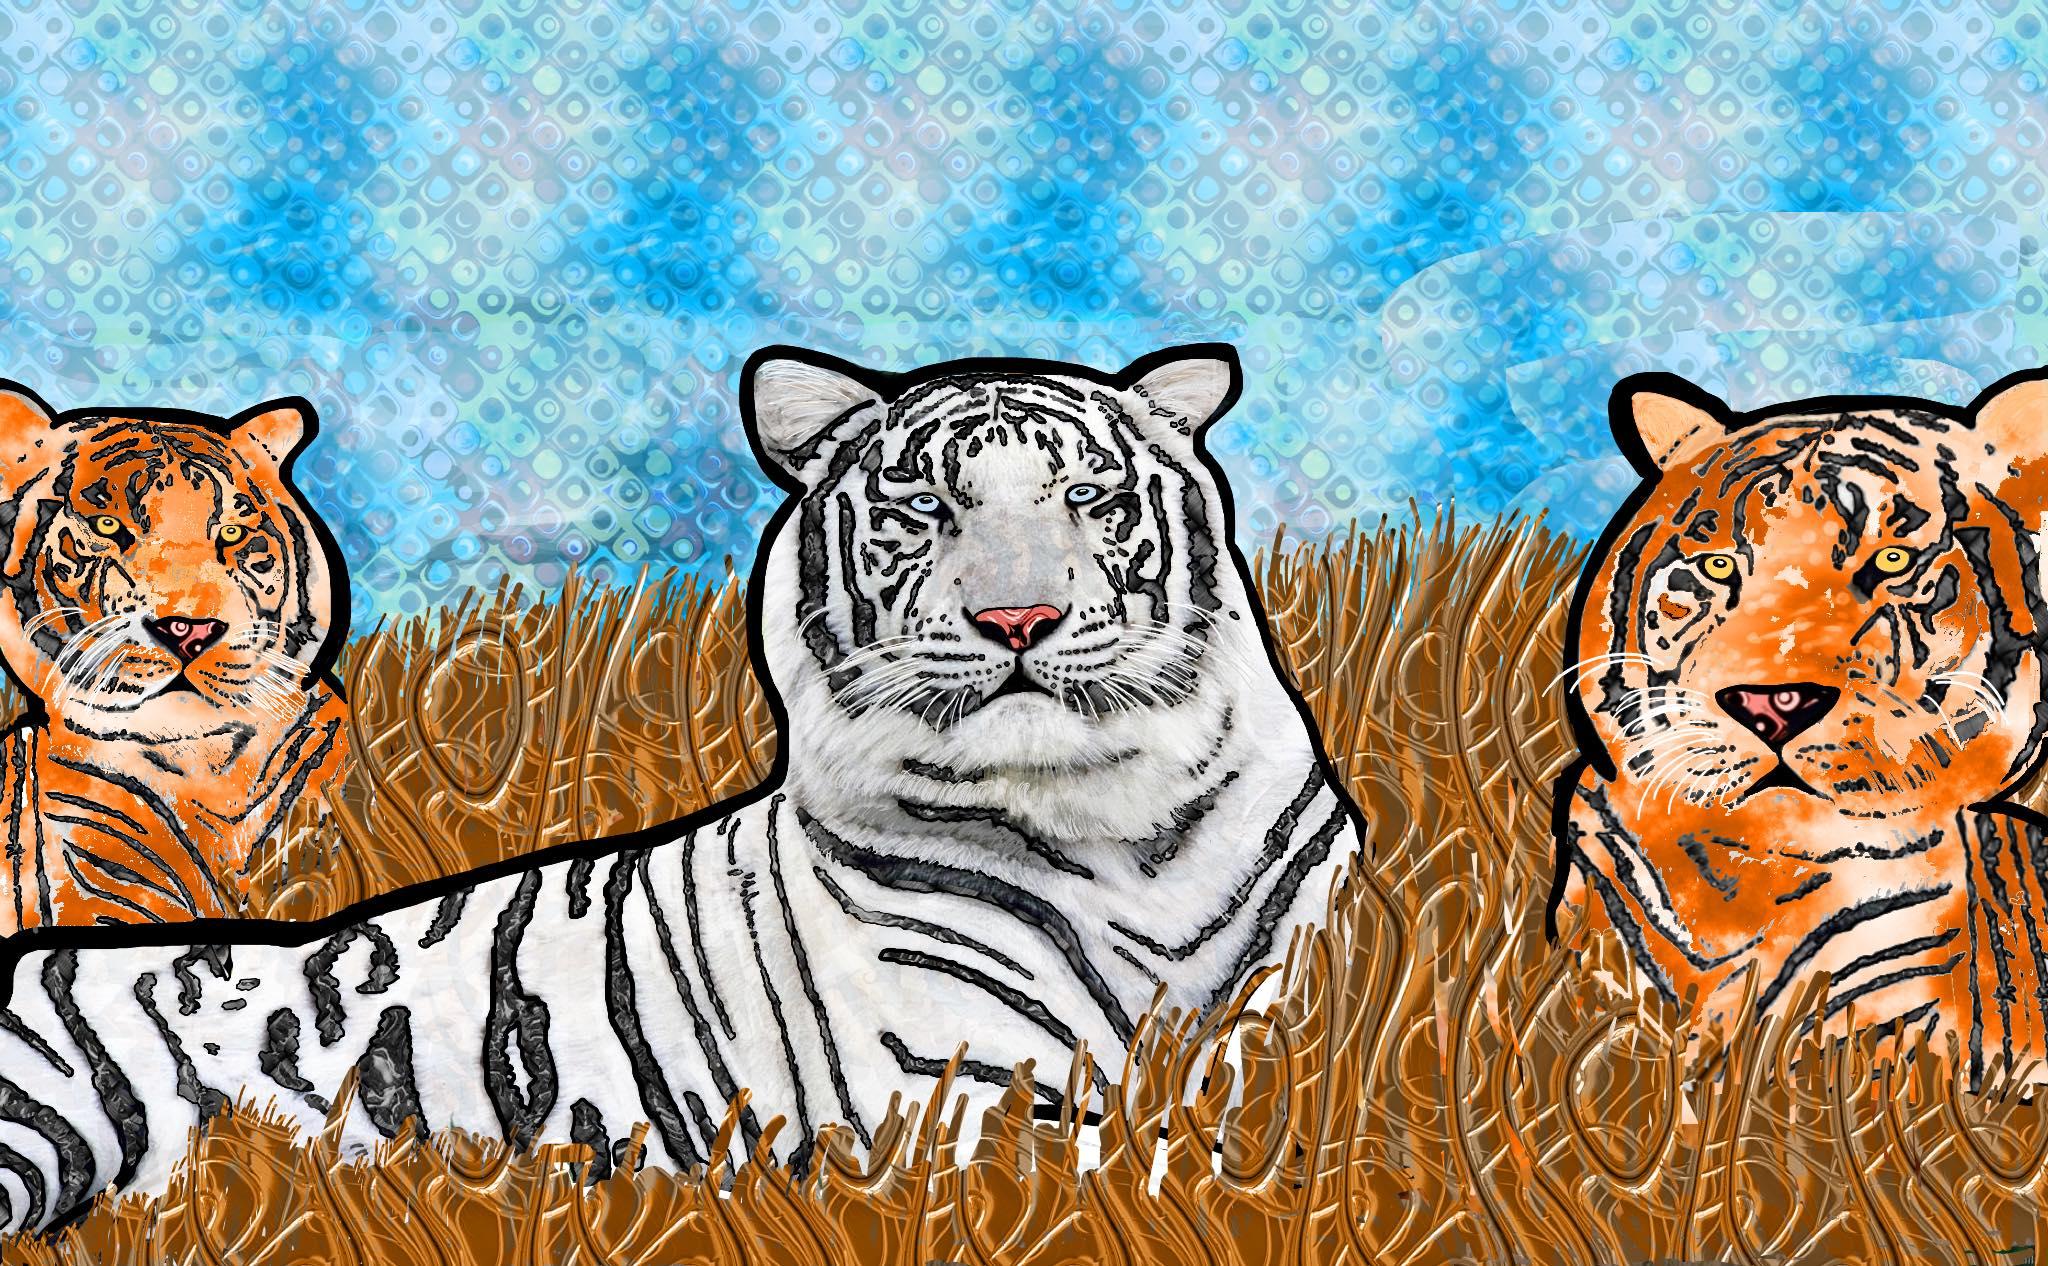 """Wise White Tiger"" from Deborah Katz's Rare Is Everywhere"